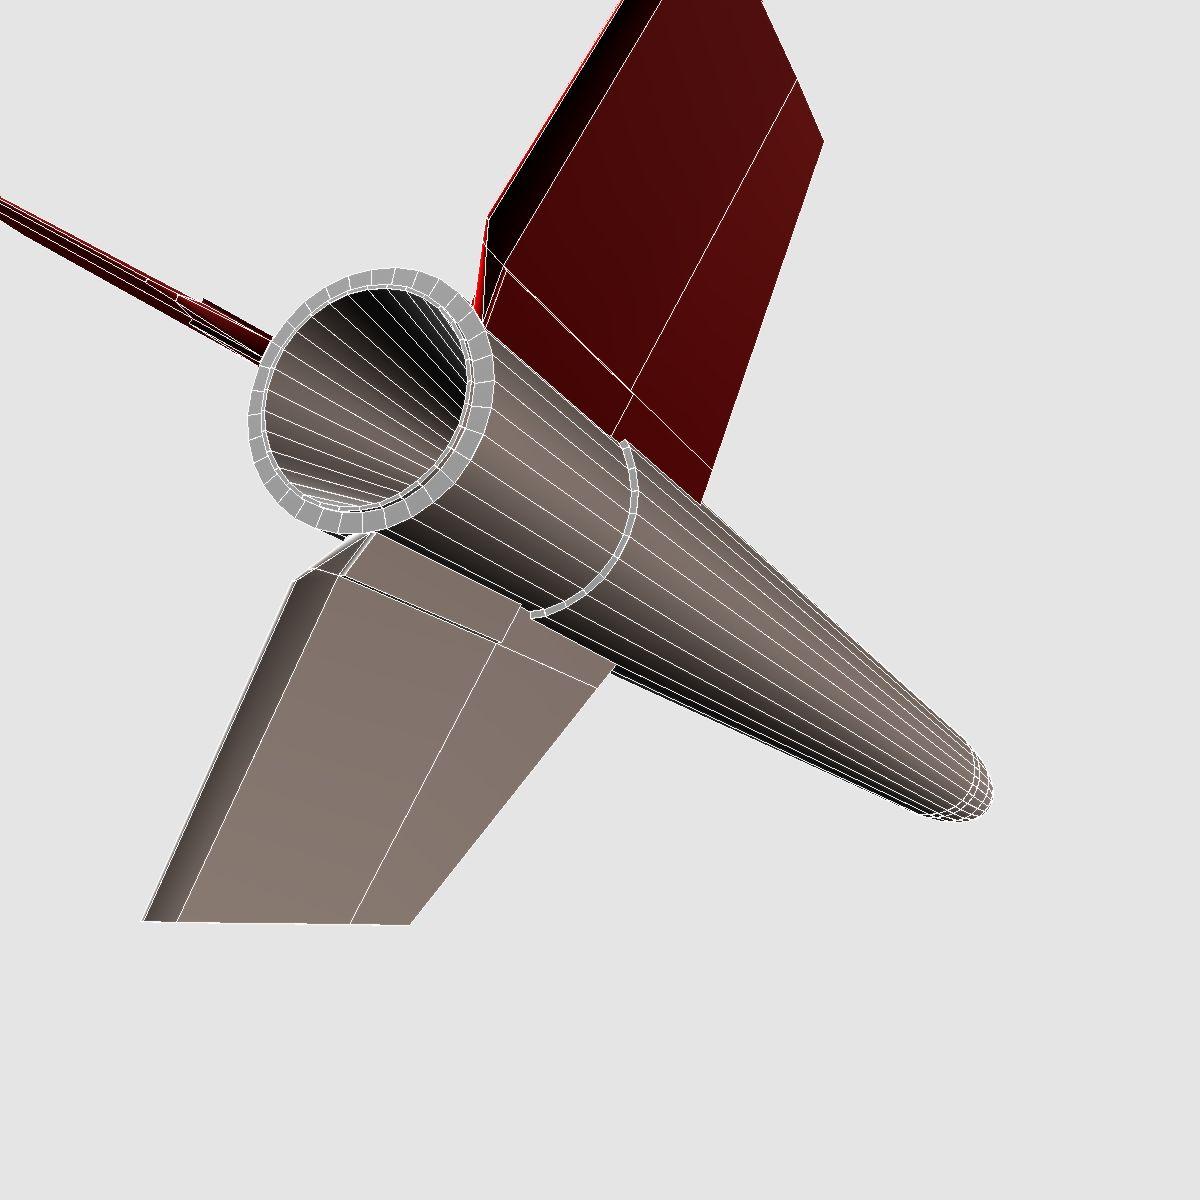 black brant vb sounding rocket 3d model 3ds dxf cob x obj 150883